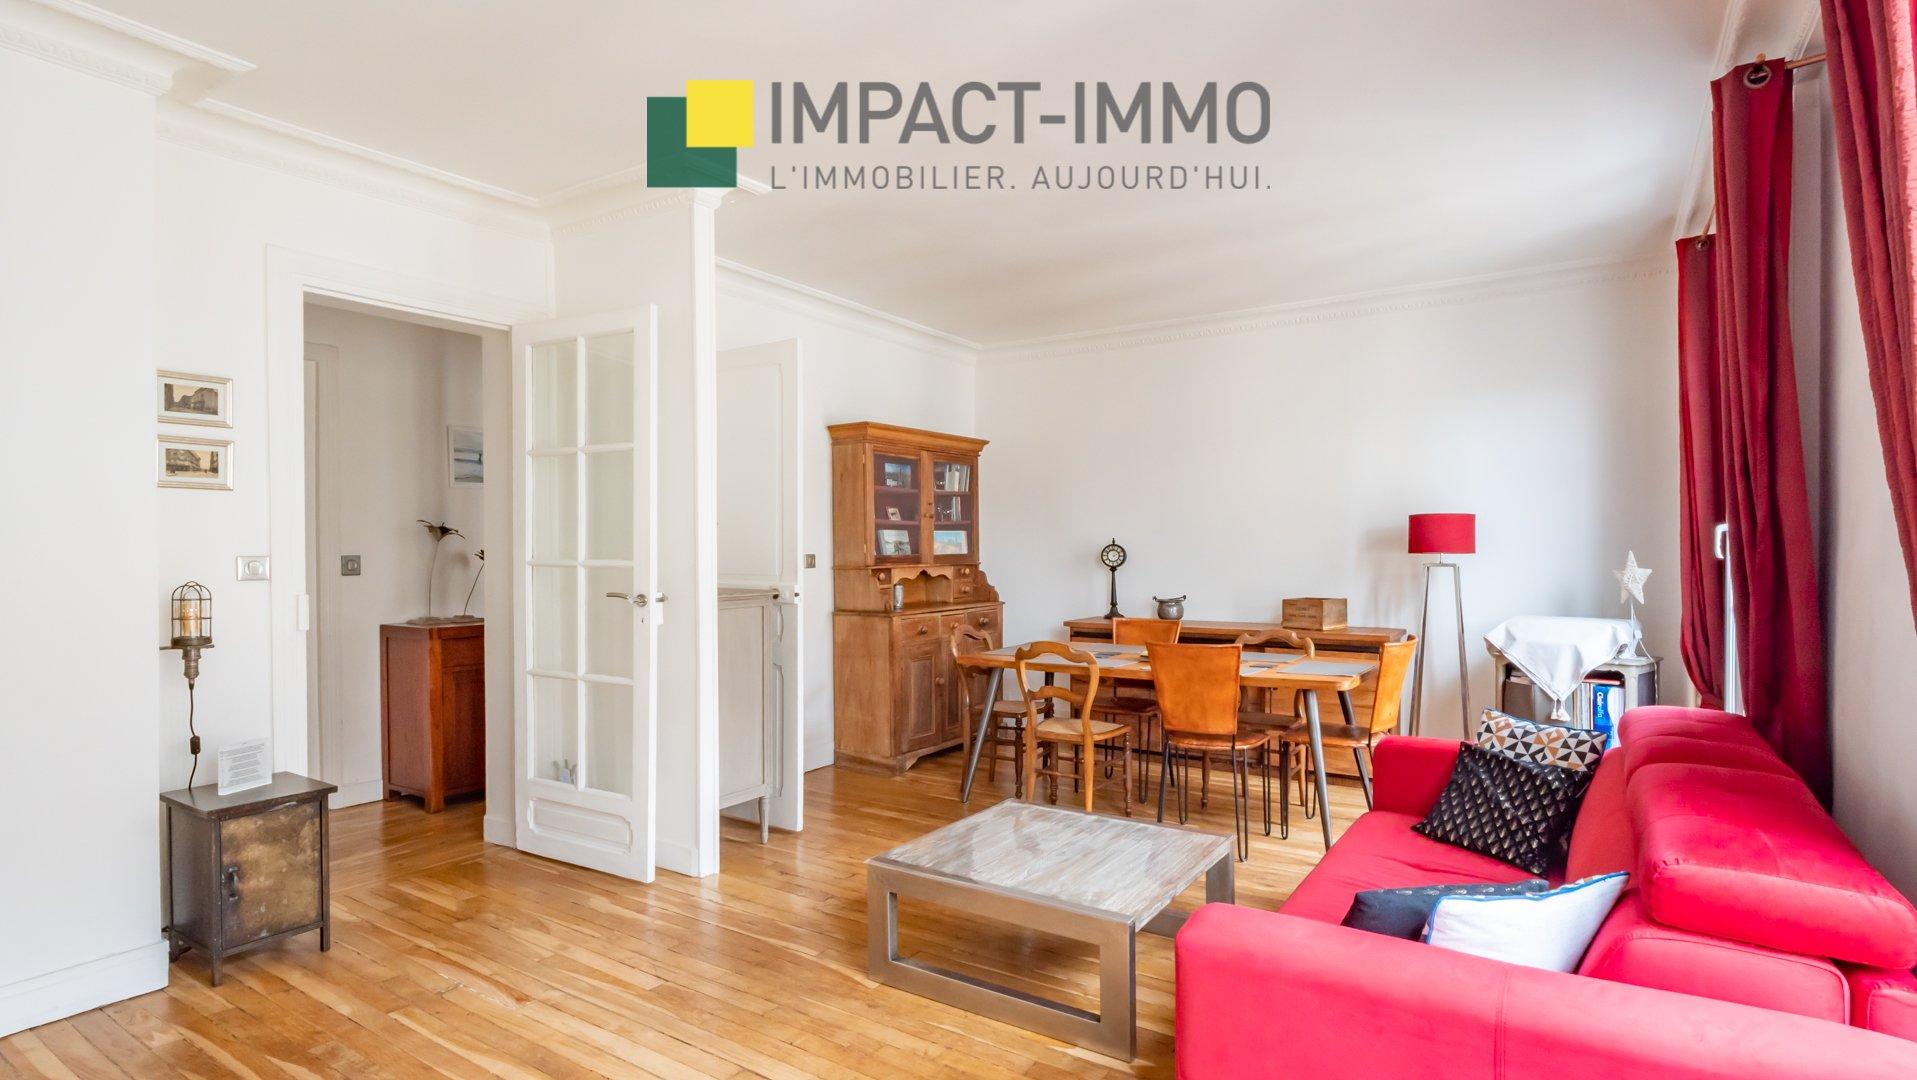 EXCLUSIVITE IMPACT-Immo - Gare de Bécon